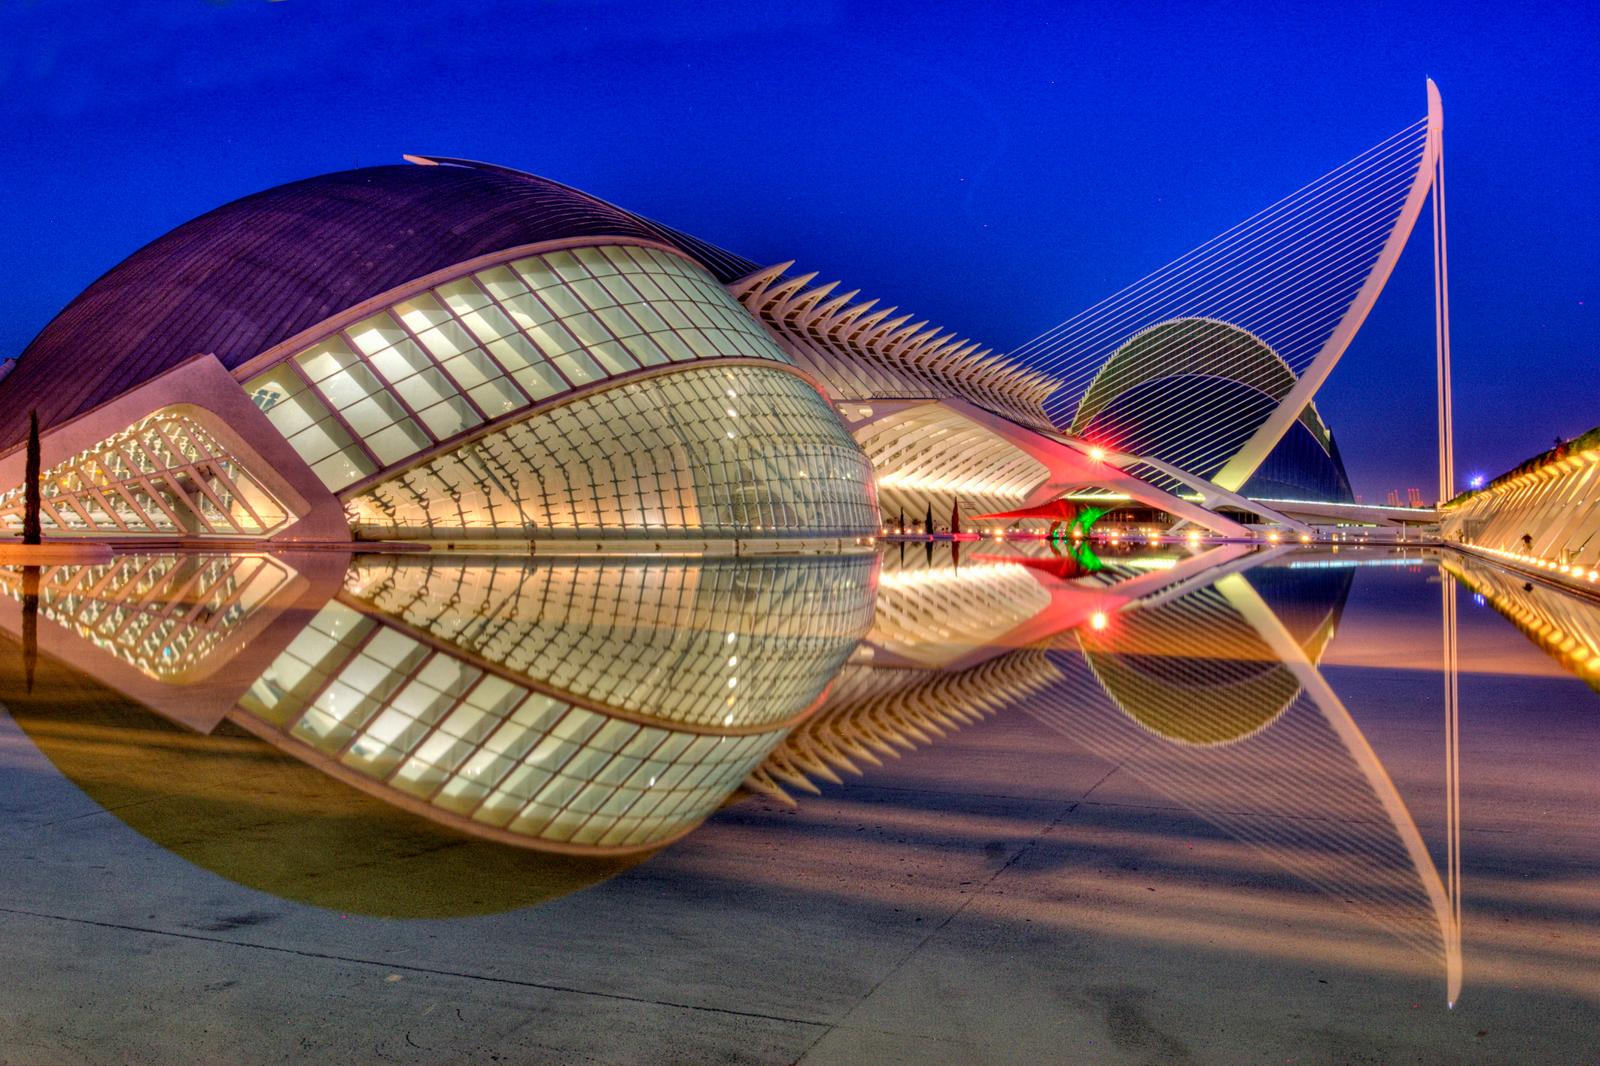 Architektur Paderborn moderne architektur santiago calatrava paderborner fototage